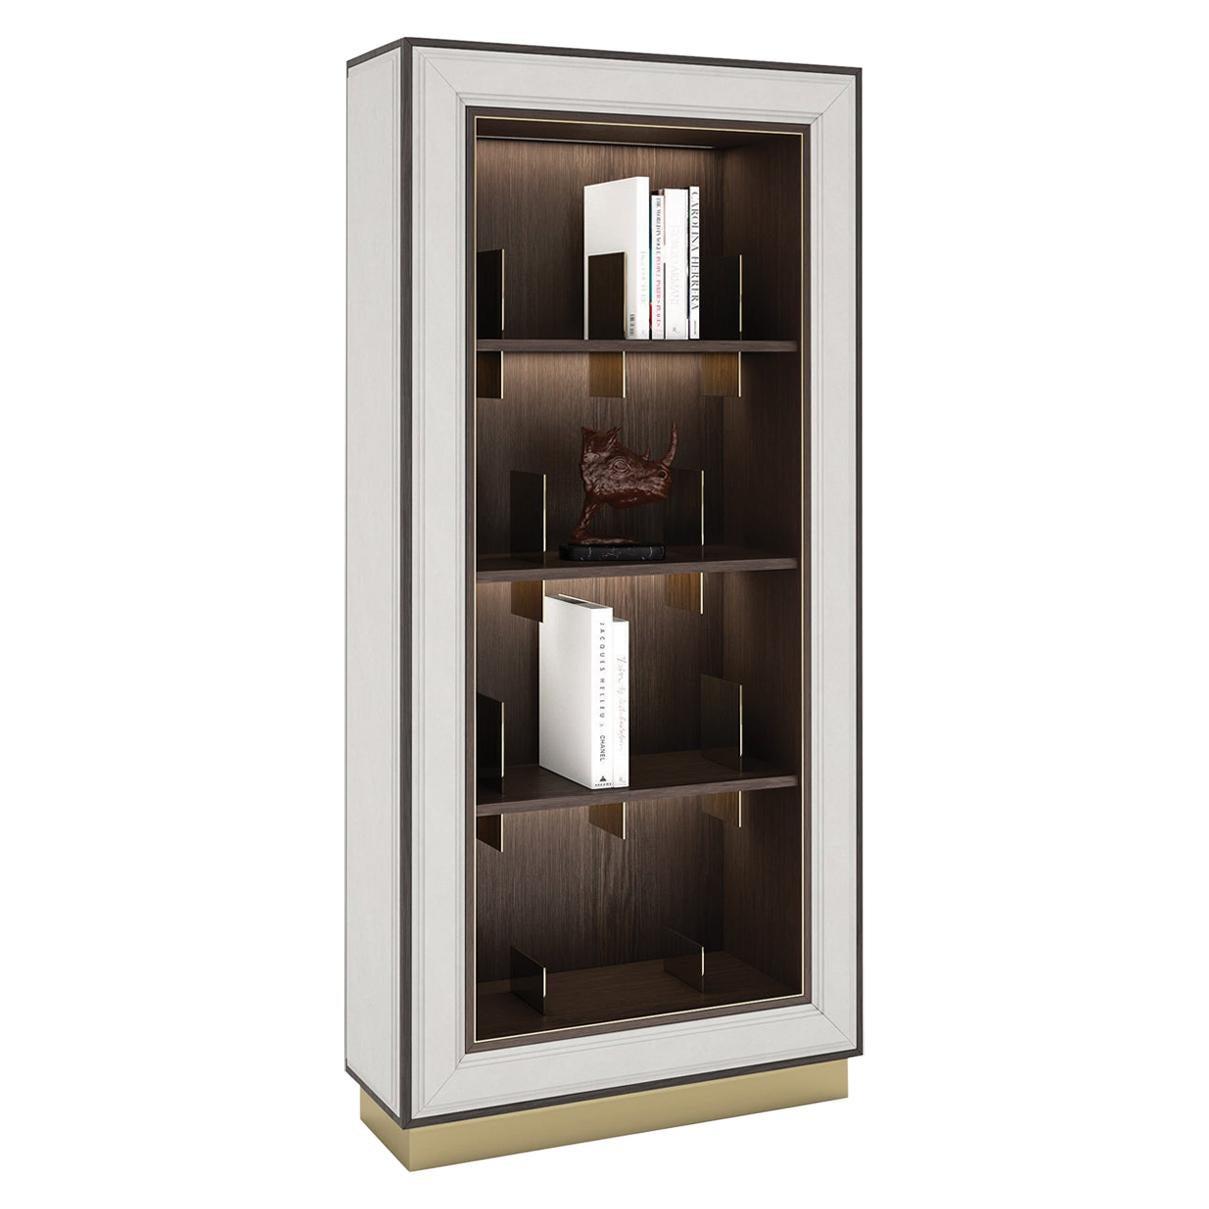 Feliz Bookcase by Giannella Ventura